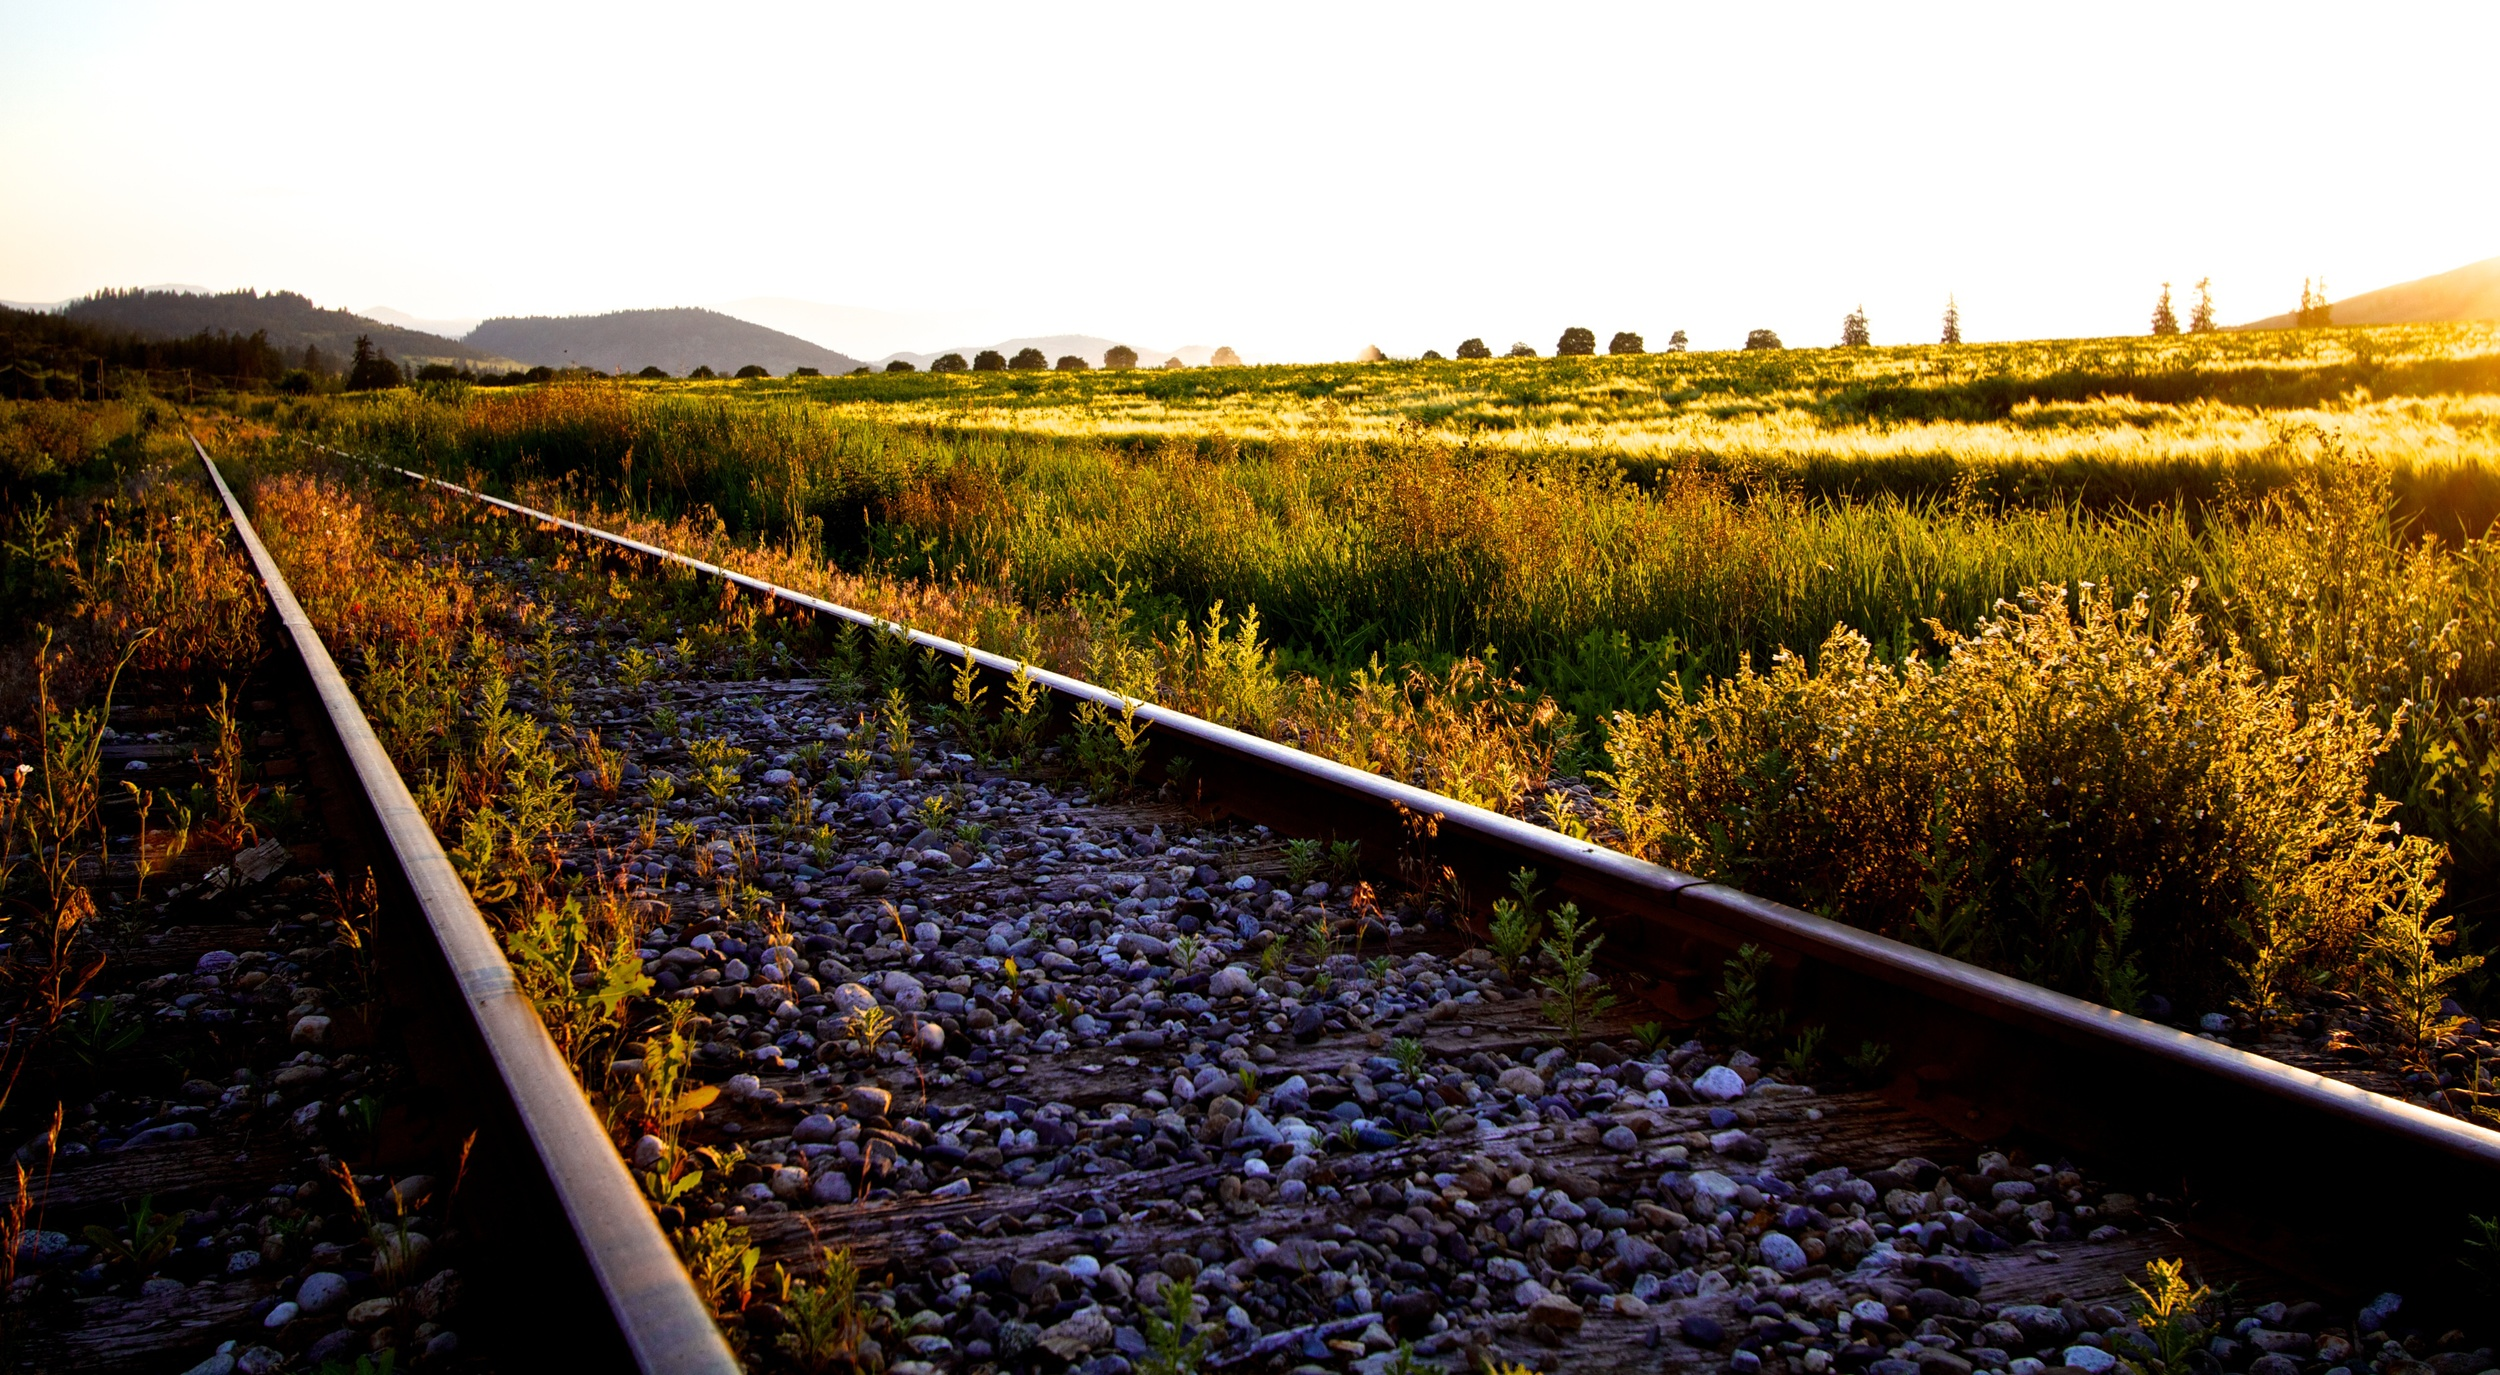 2013-07-08 at 20-31-56 Train, Tracks, Purple, Sunset, Yellow, Rocks.jpg